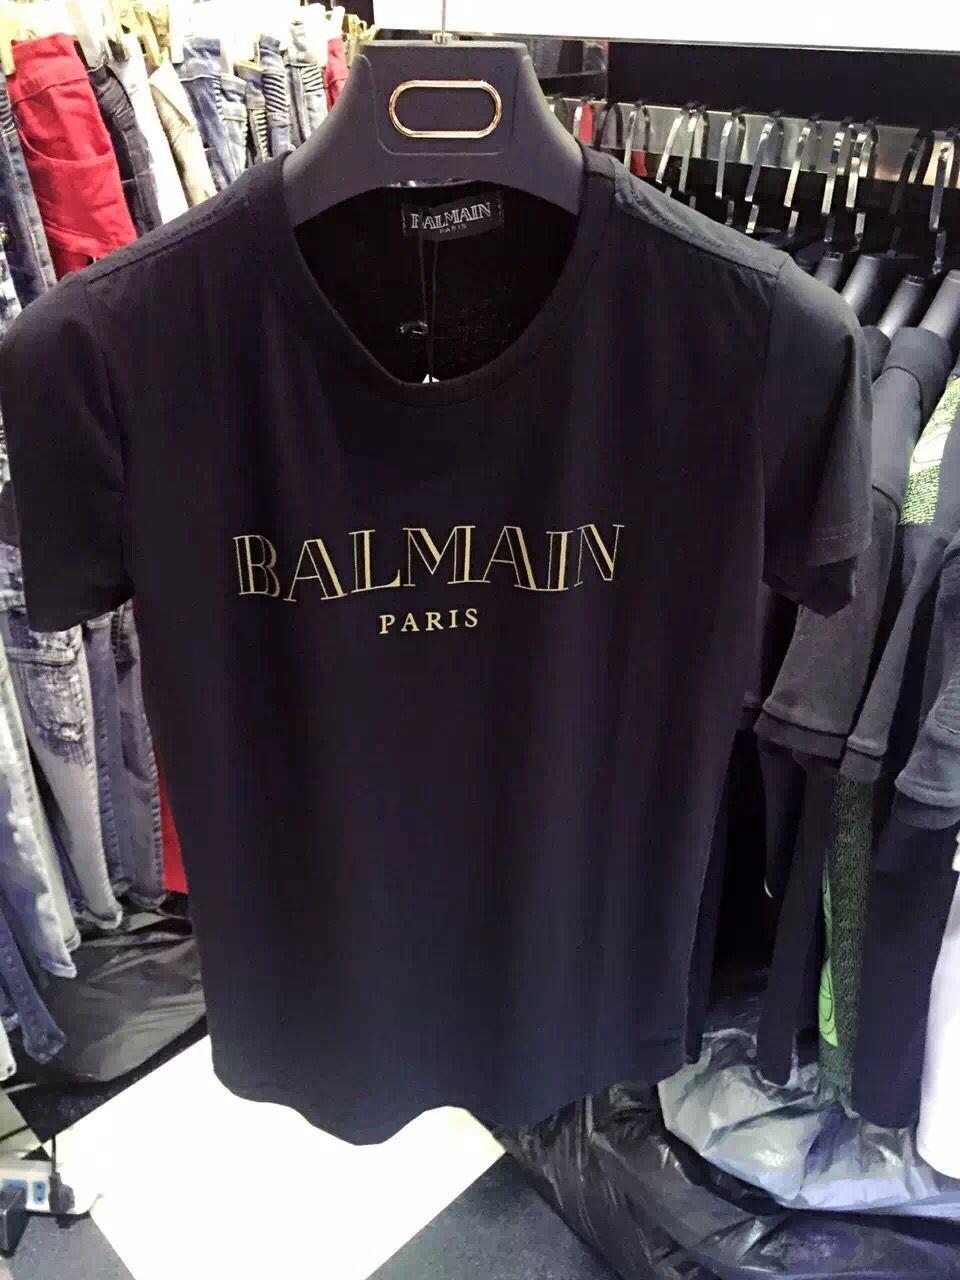 Hot New Men Men'S Short Sleeved T Shirt Balmain Paris Top Good ...